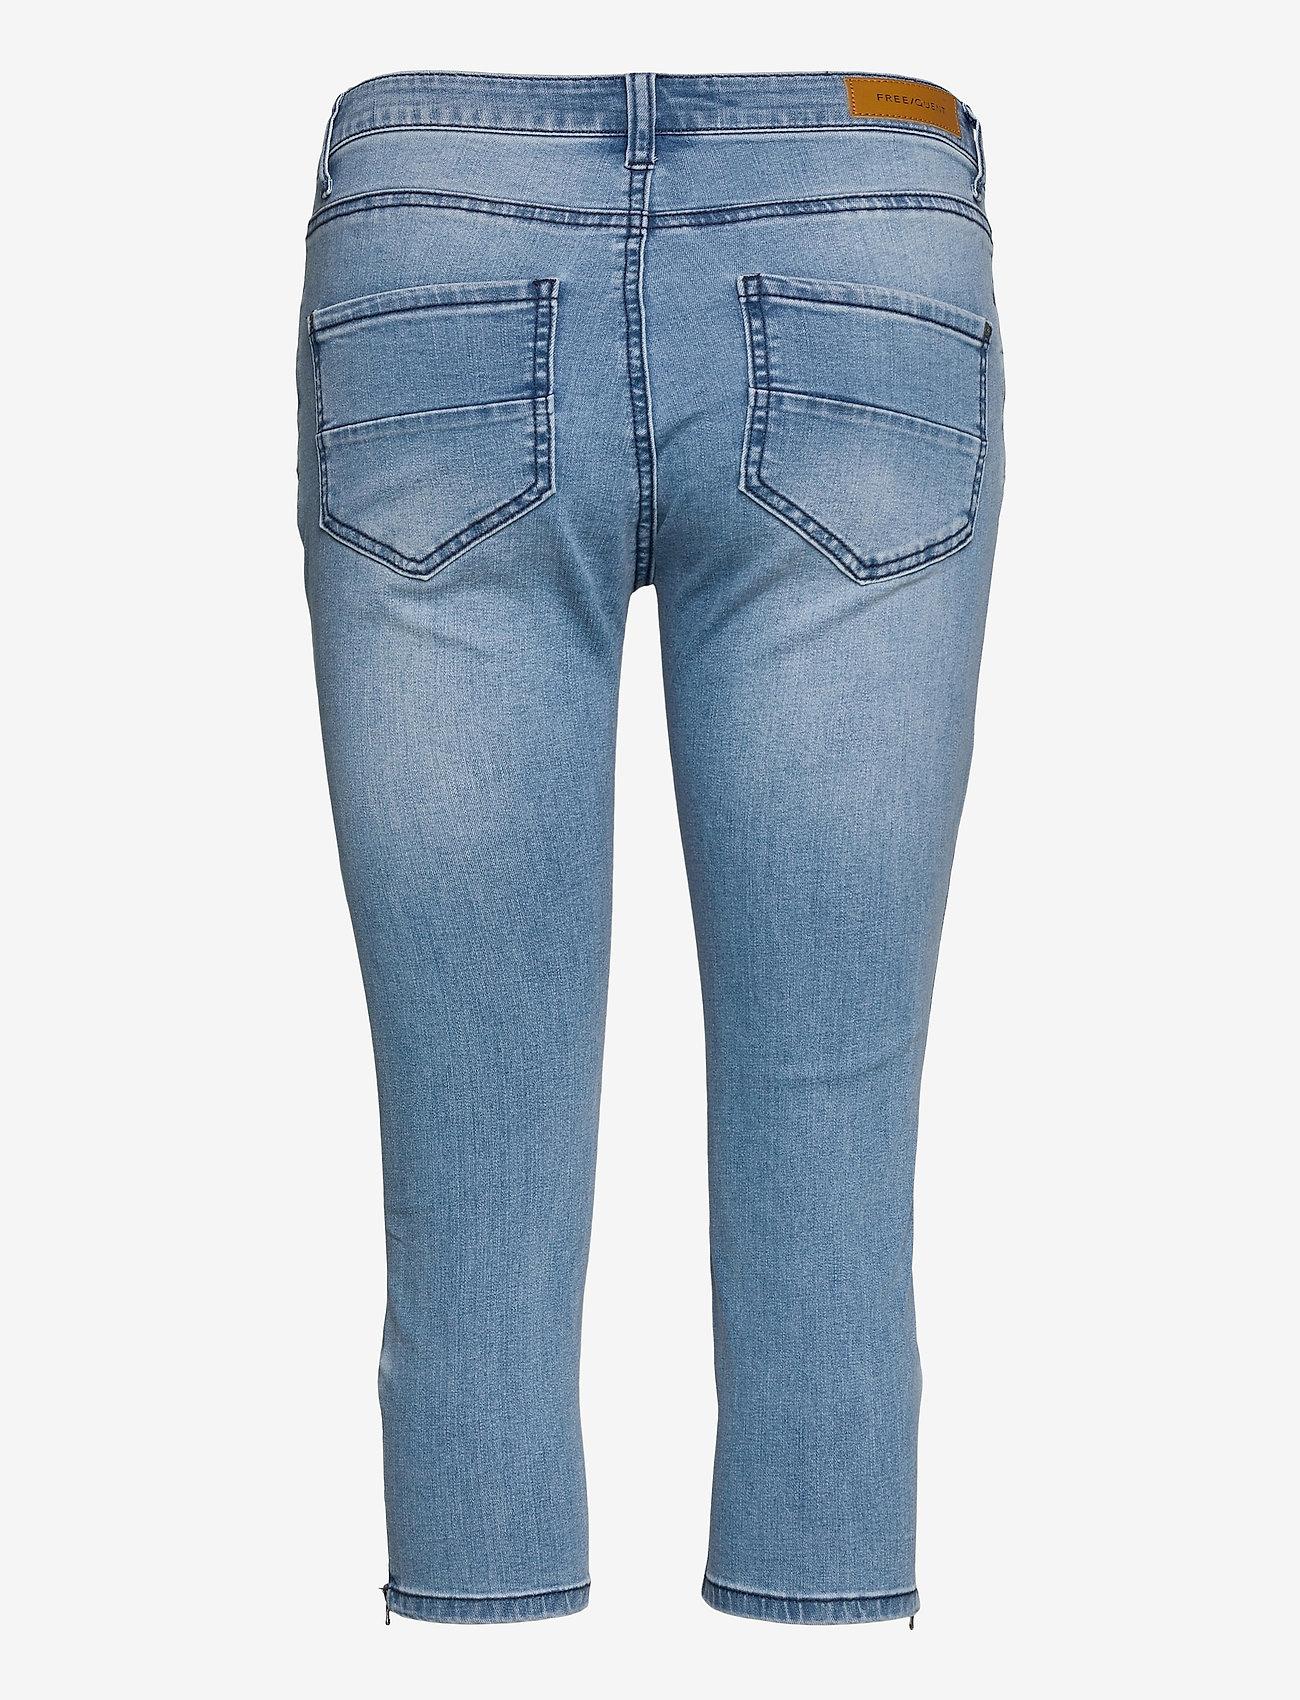 FREE/QUENT - AIDA-CA-DENIM - slim jeans - light blue denim - 1